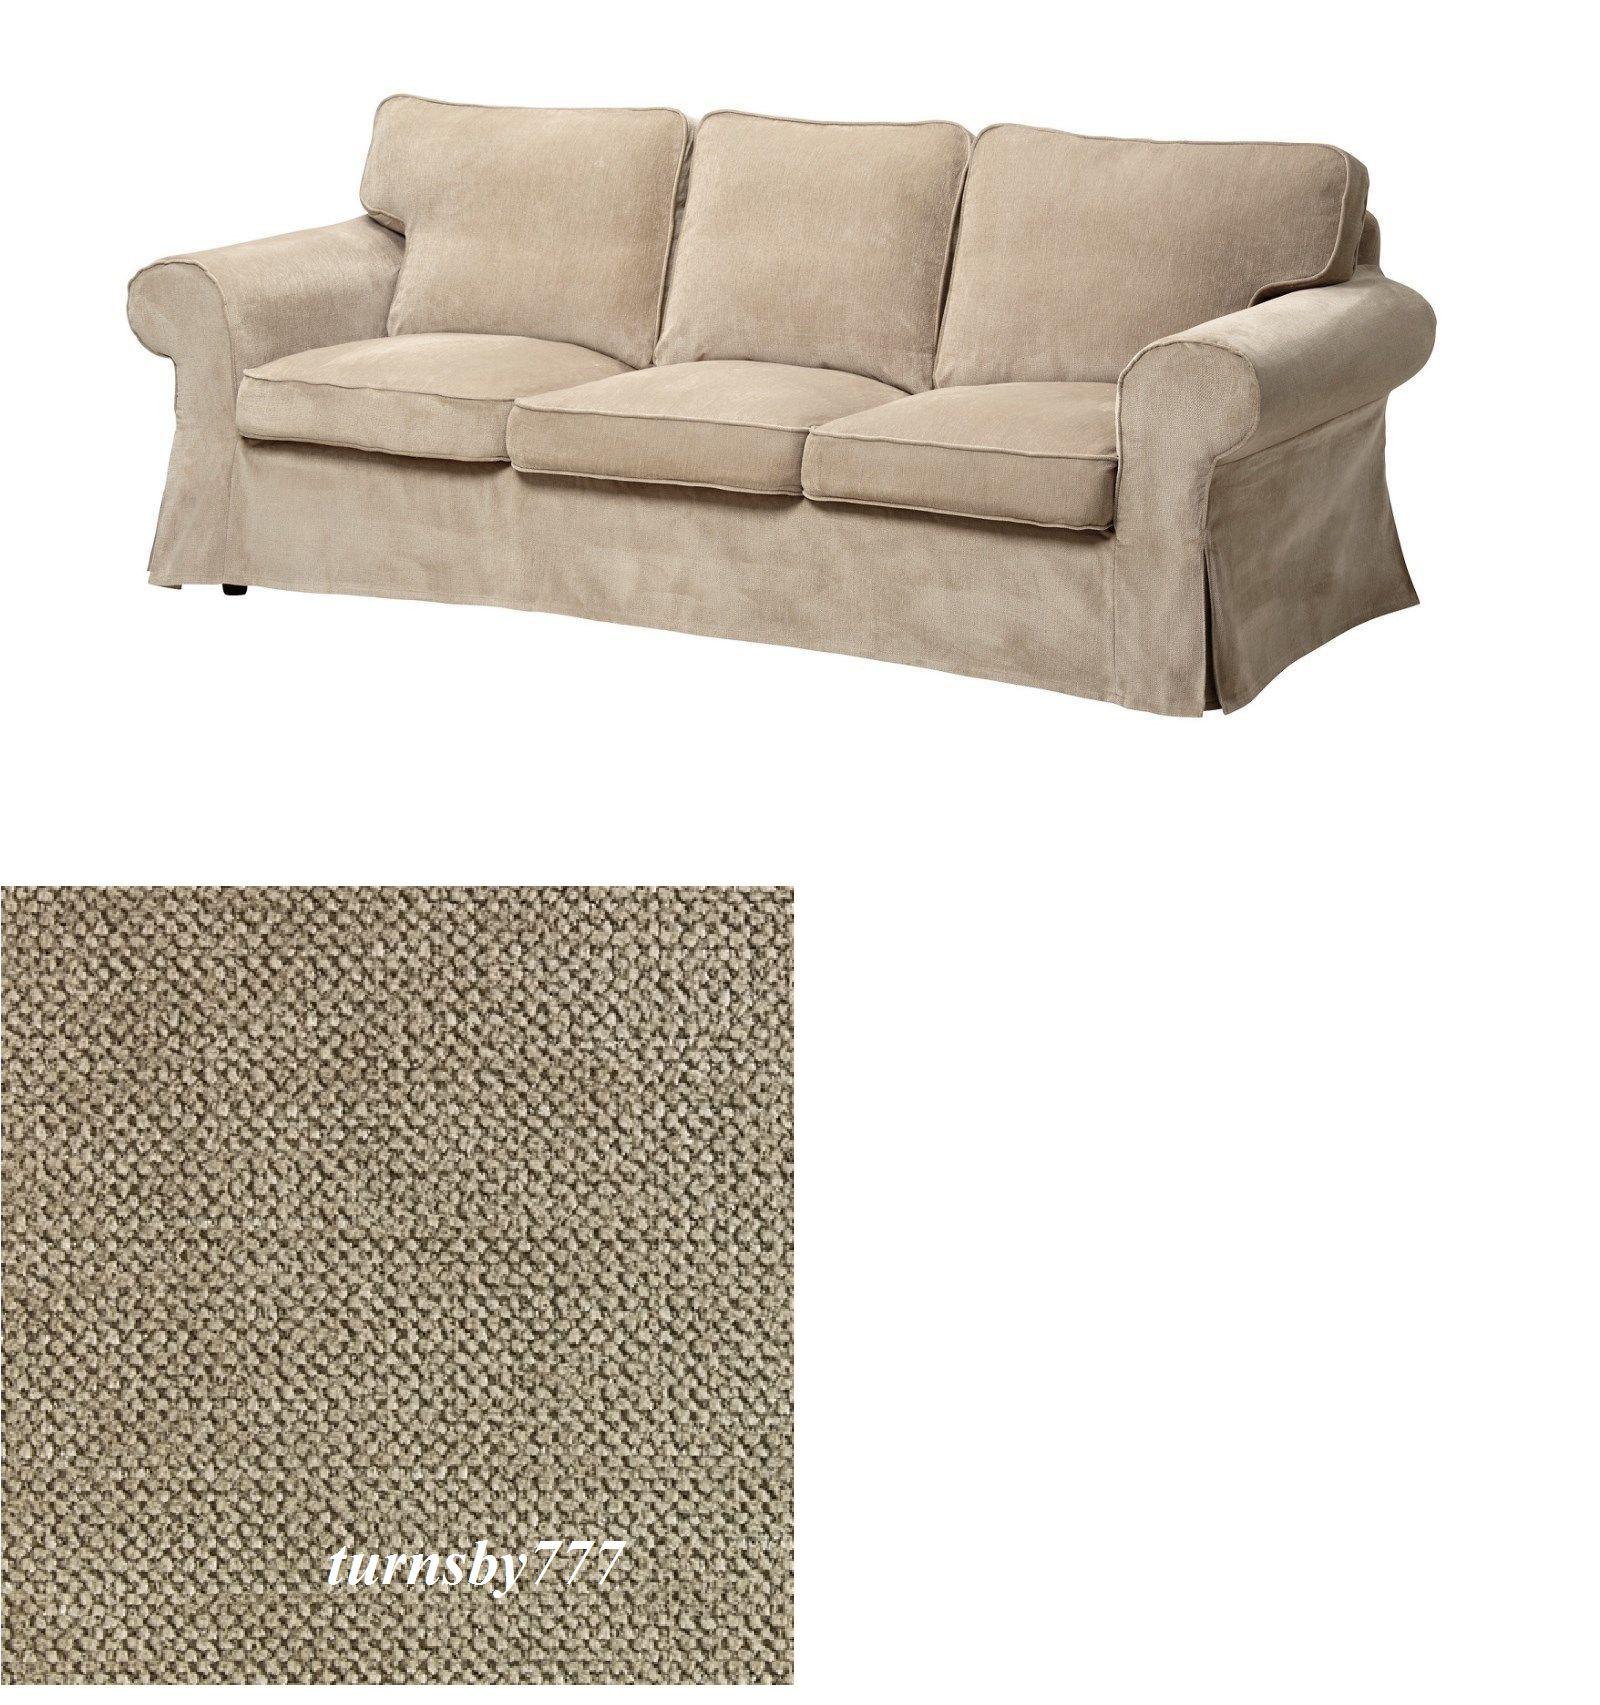 Slipcovers 175754: Ikea Ektorp Sofa Slipcover Vellinge Beige Three Seat  Sofa Cover  U003e BUY